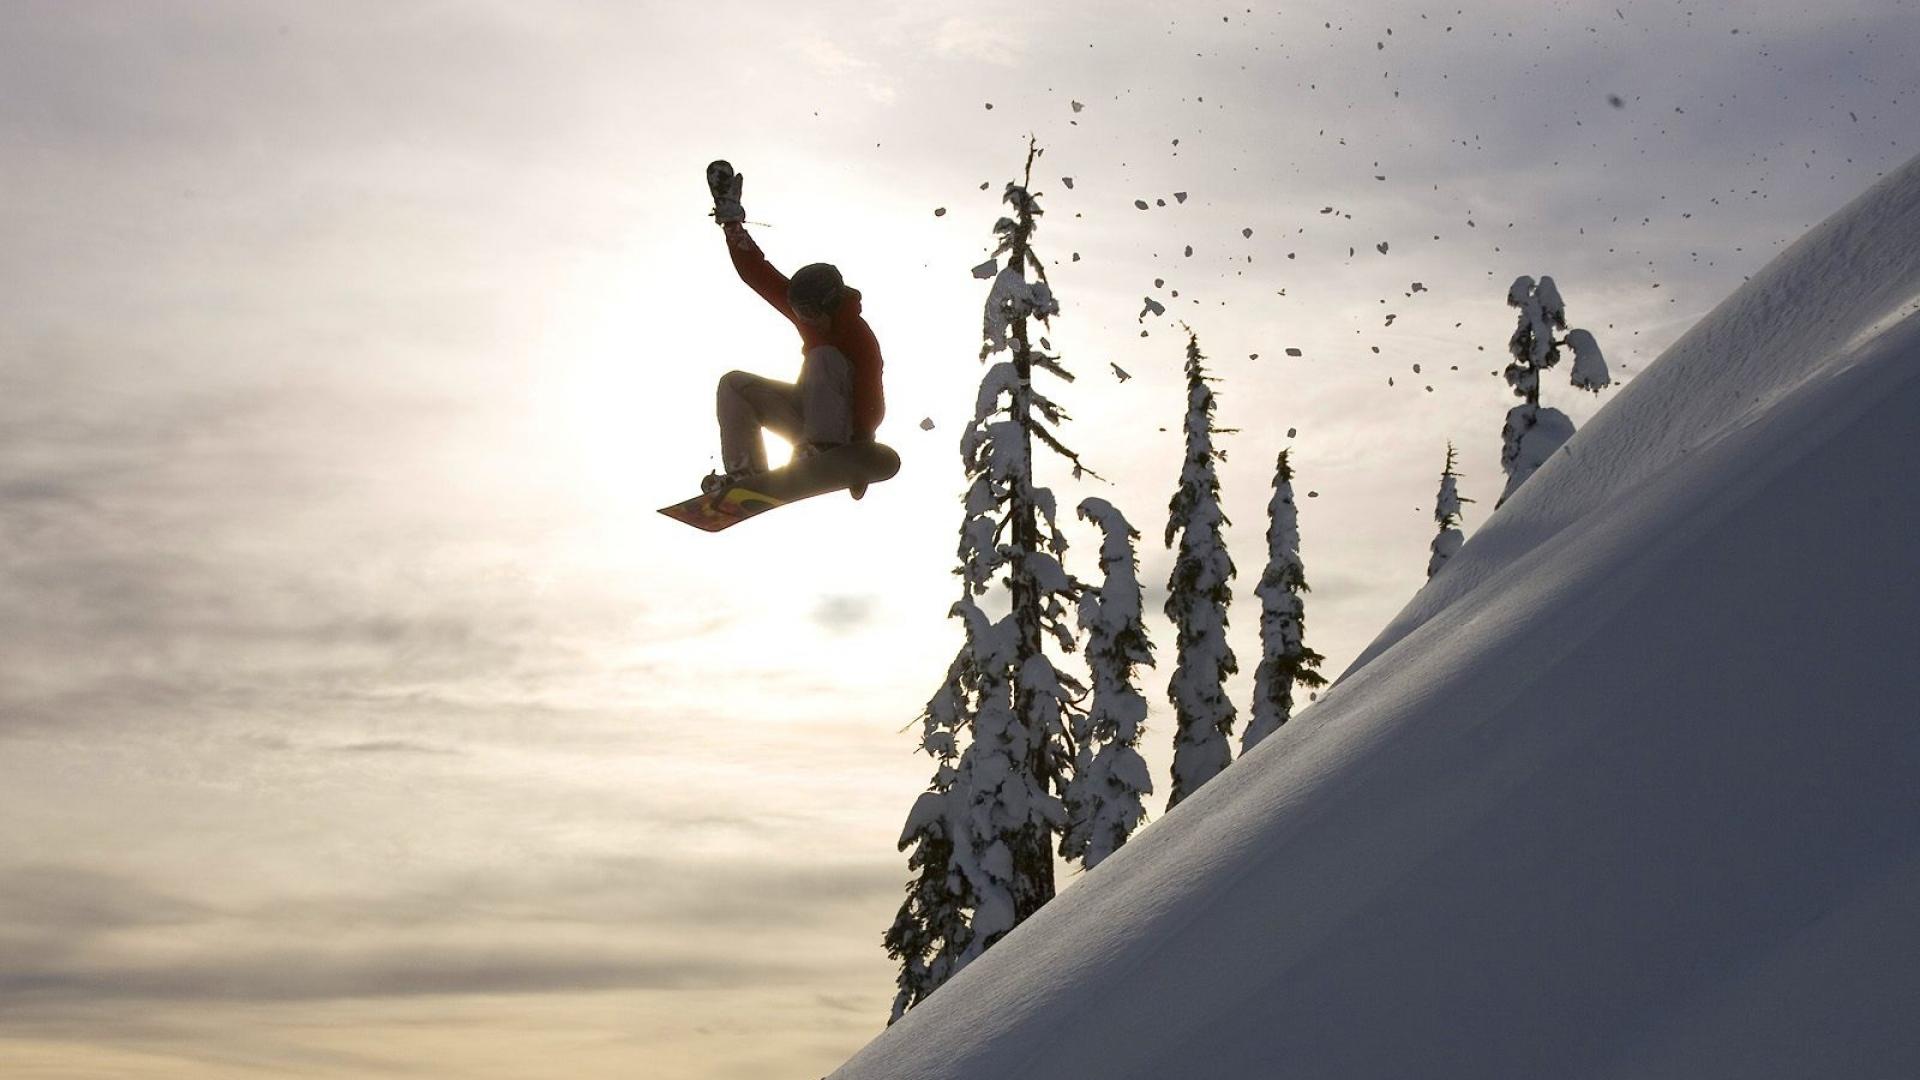 Download wallpaper 1920x1080 snowboard jump descent evening full snowboard jump descent voltagebd Image collections